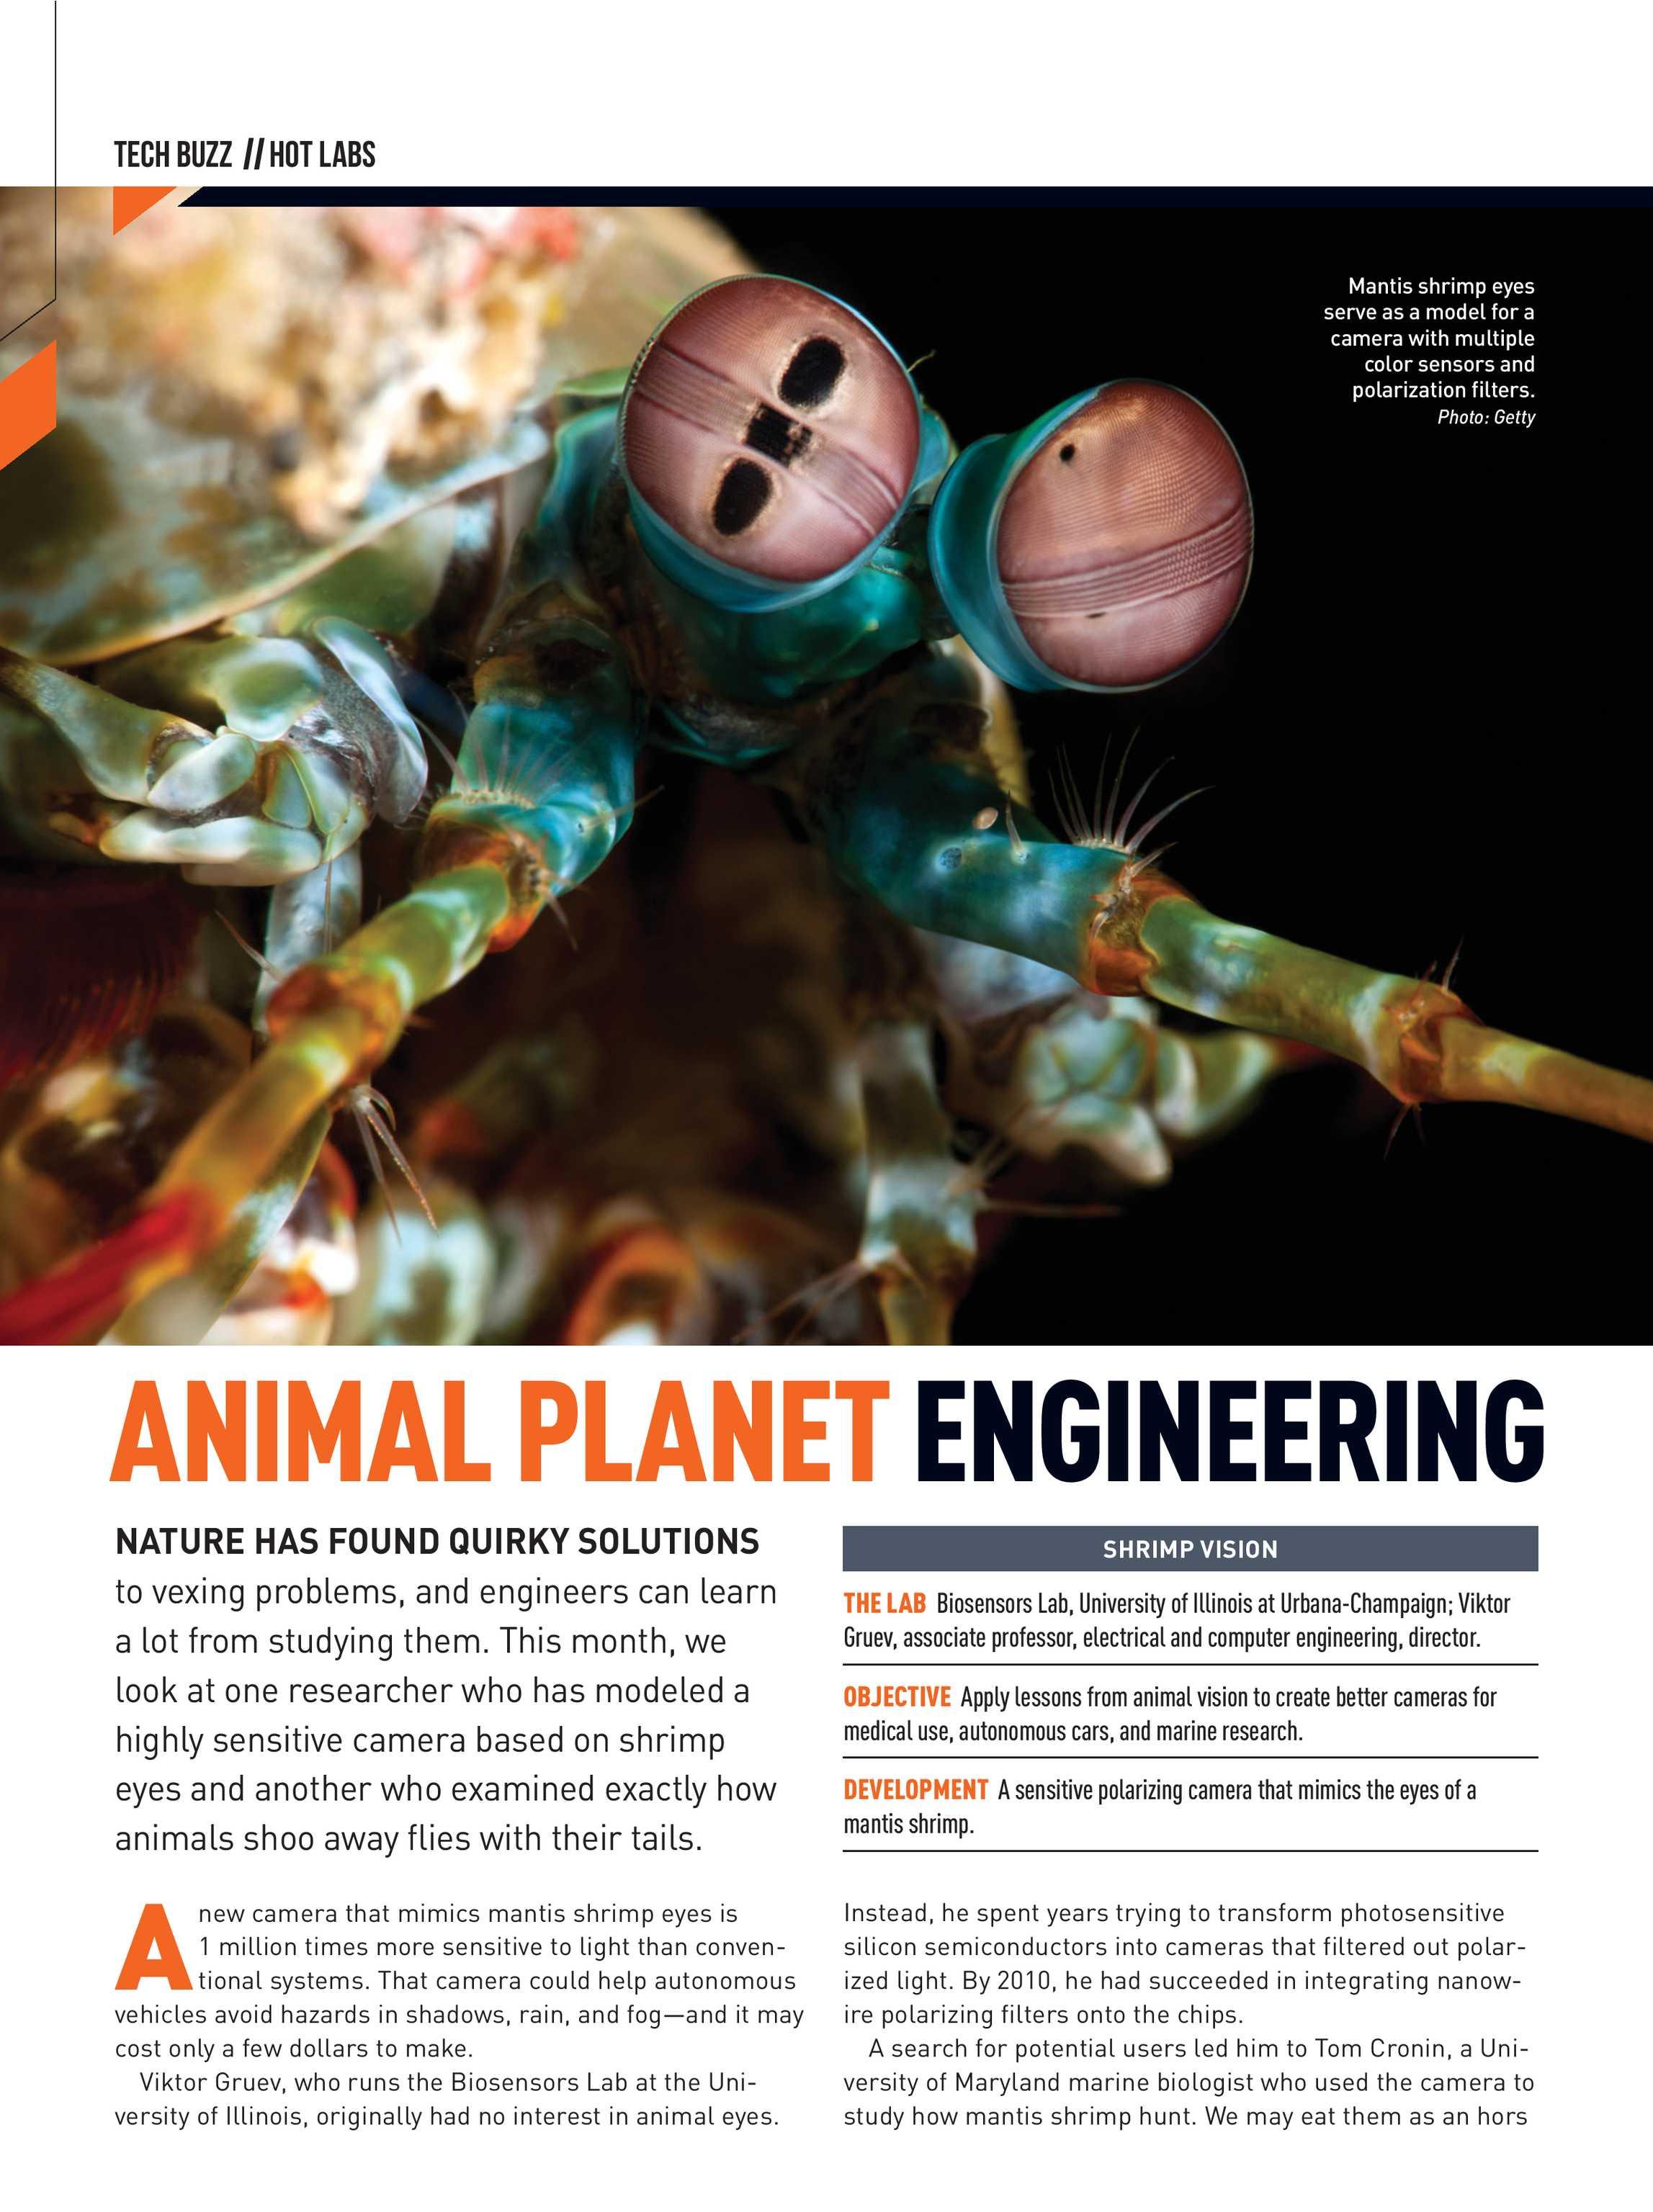 Mechanical Engineering Magazine - December 2018 - page 23